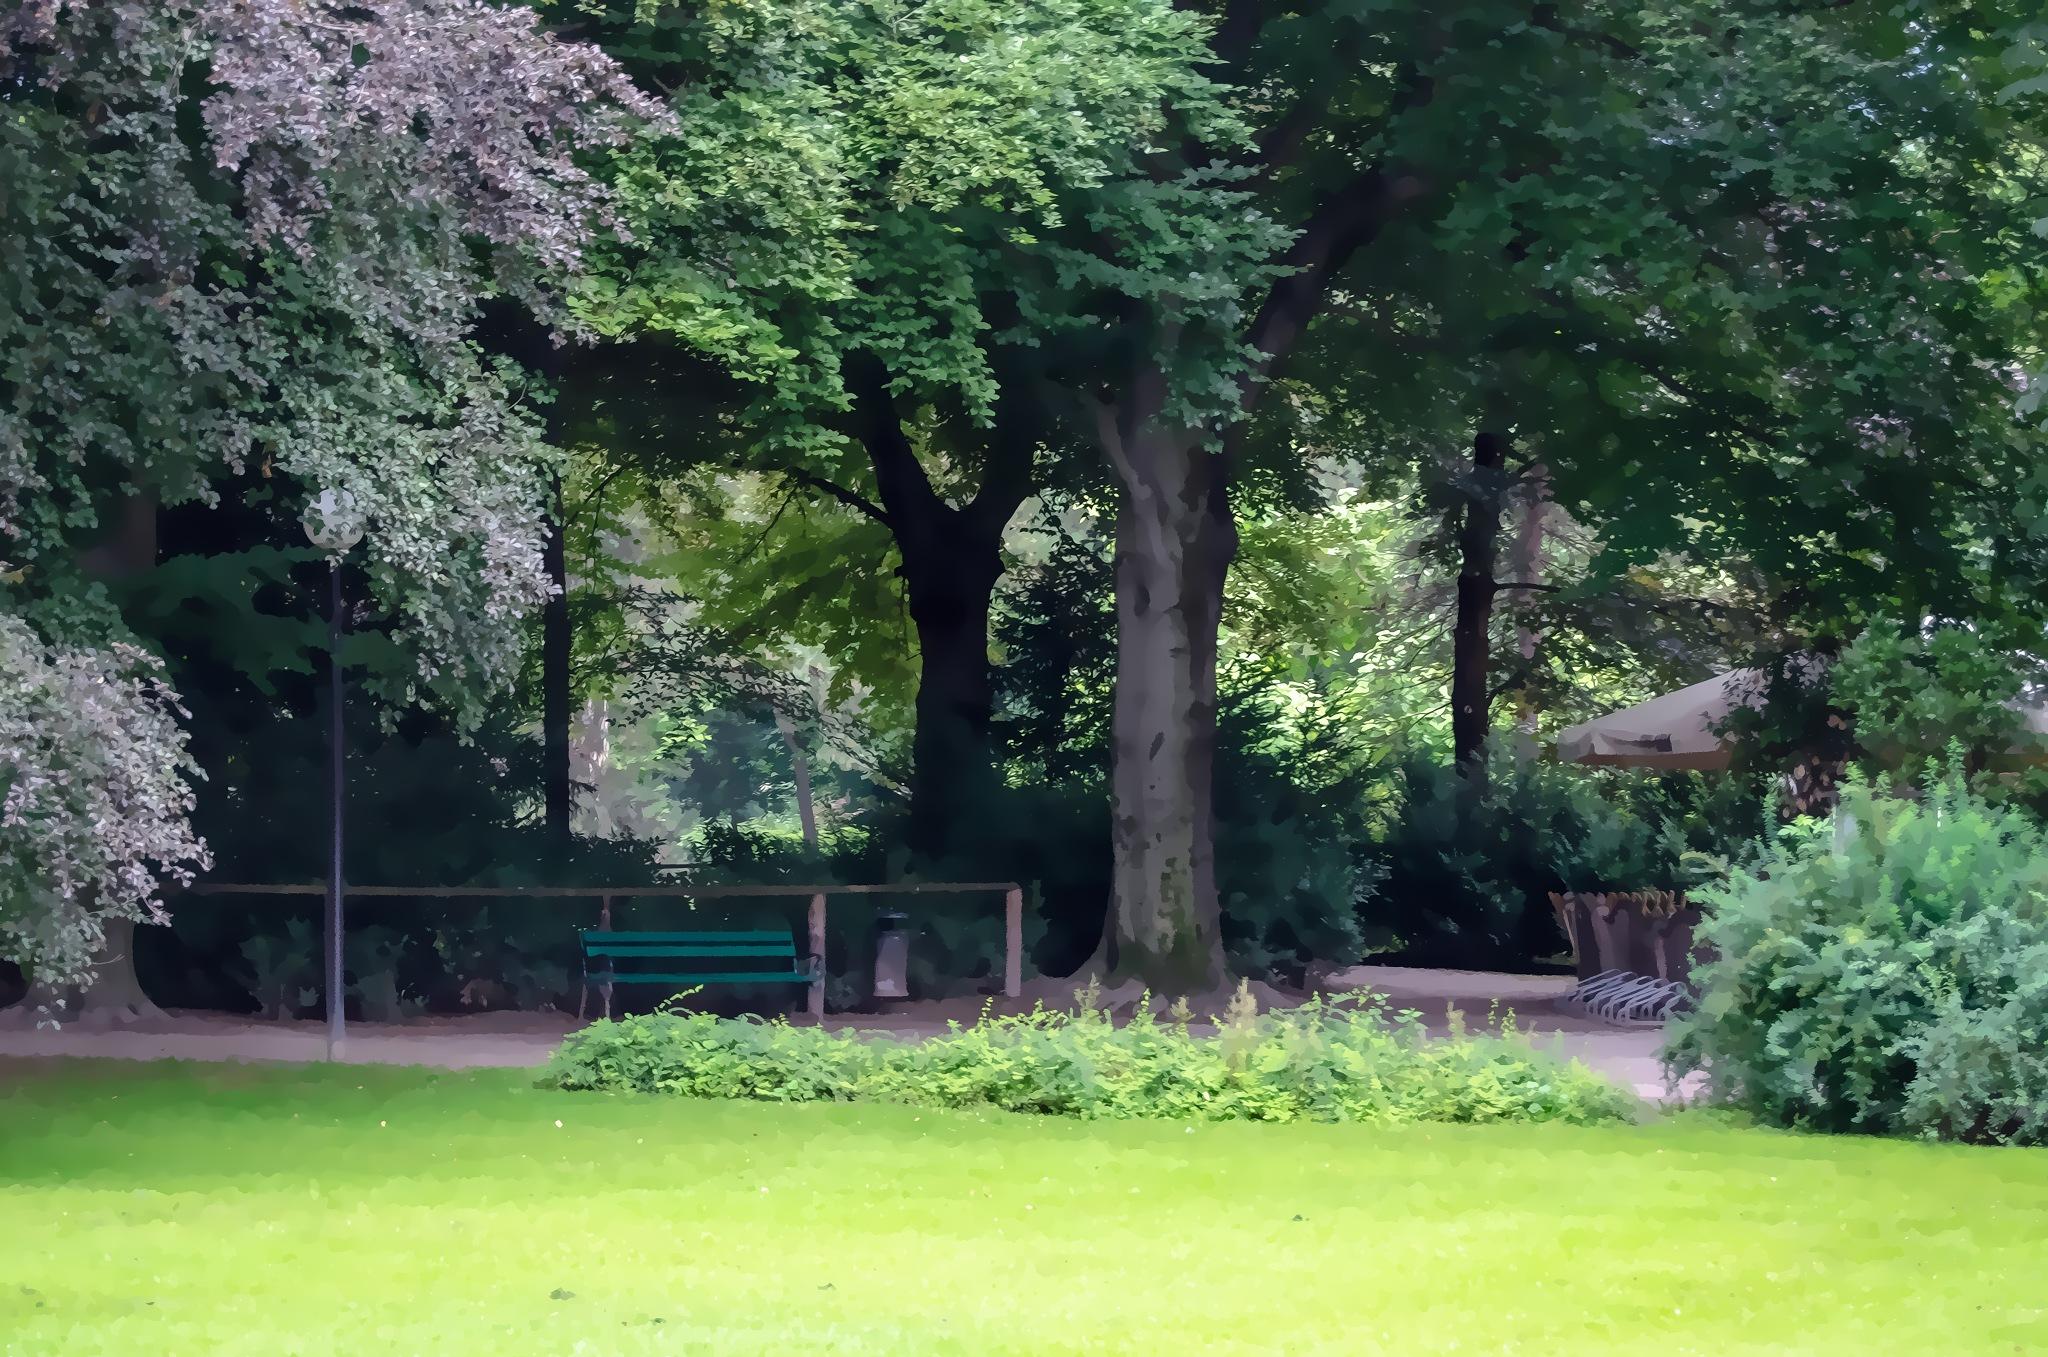 Innsbruck Garden by Borja Robles